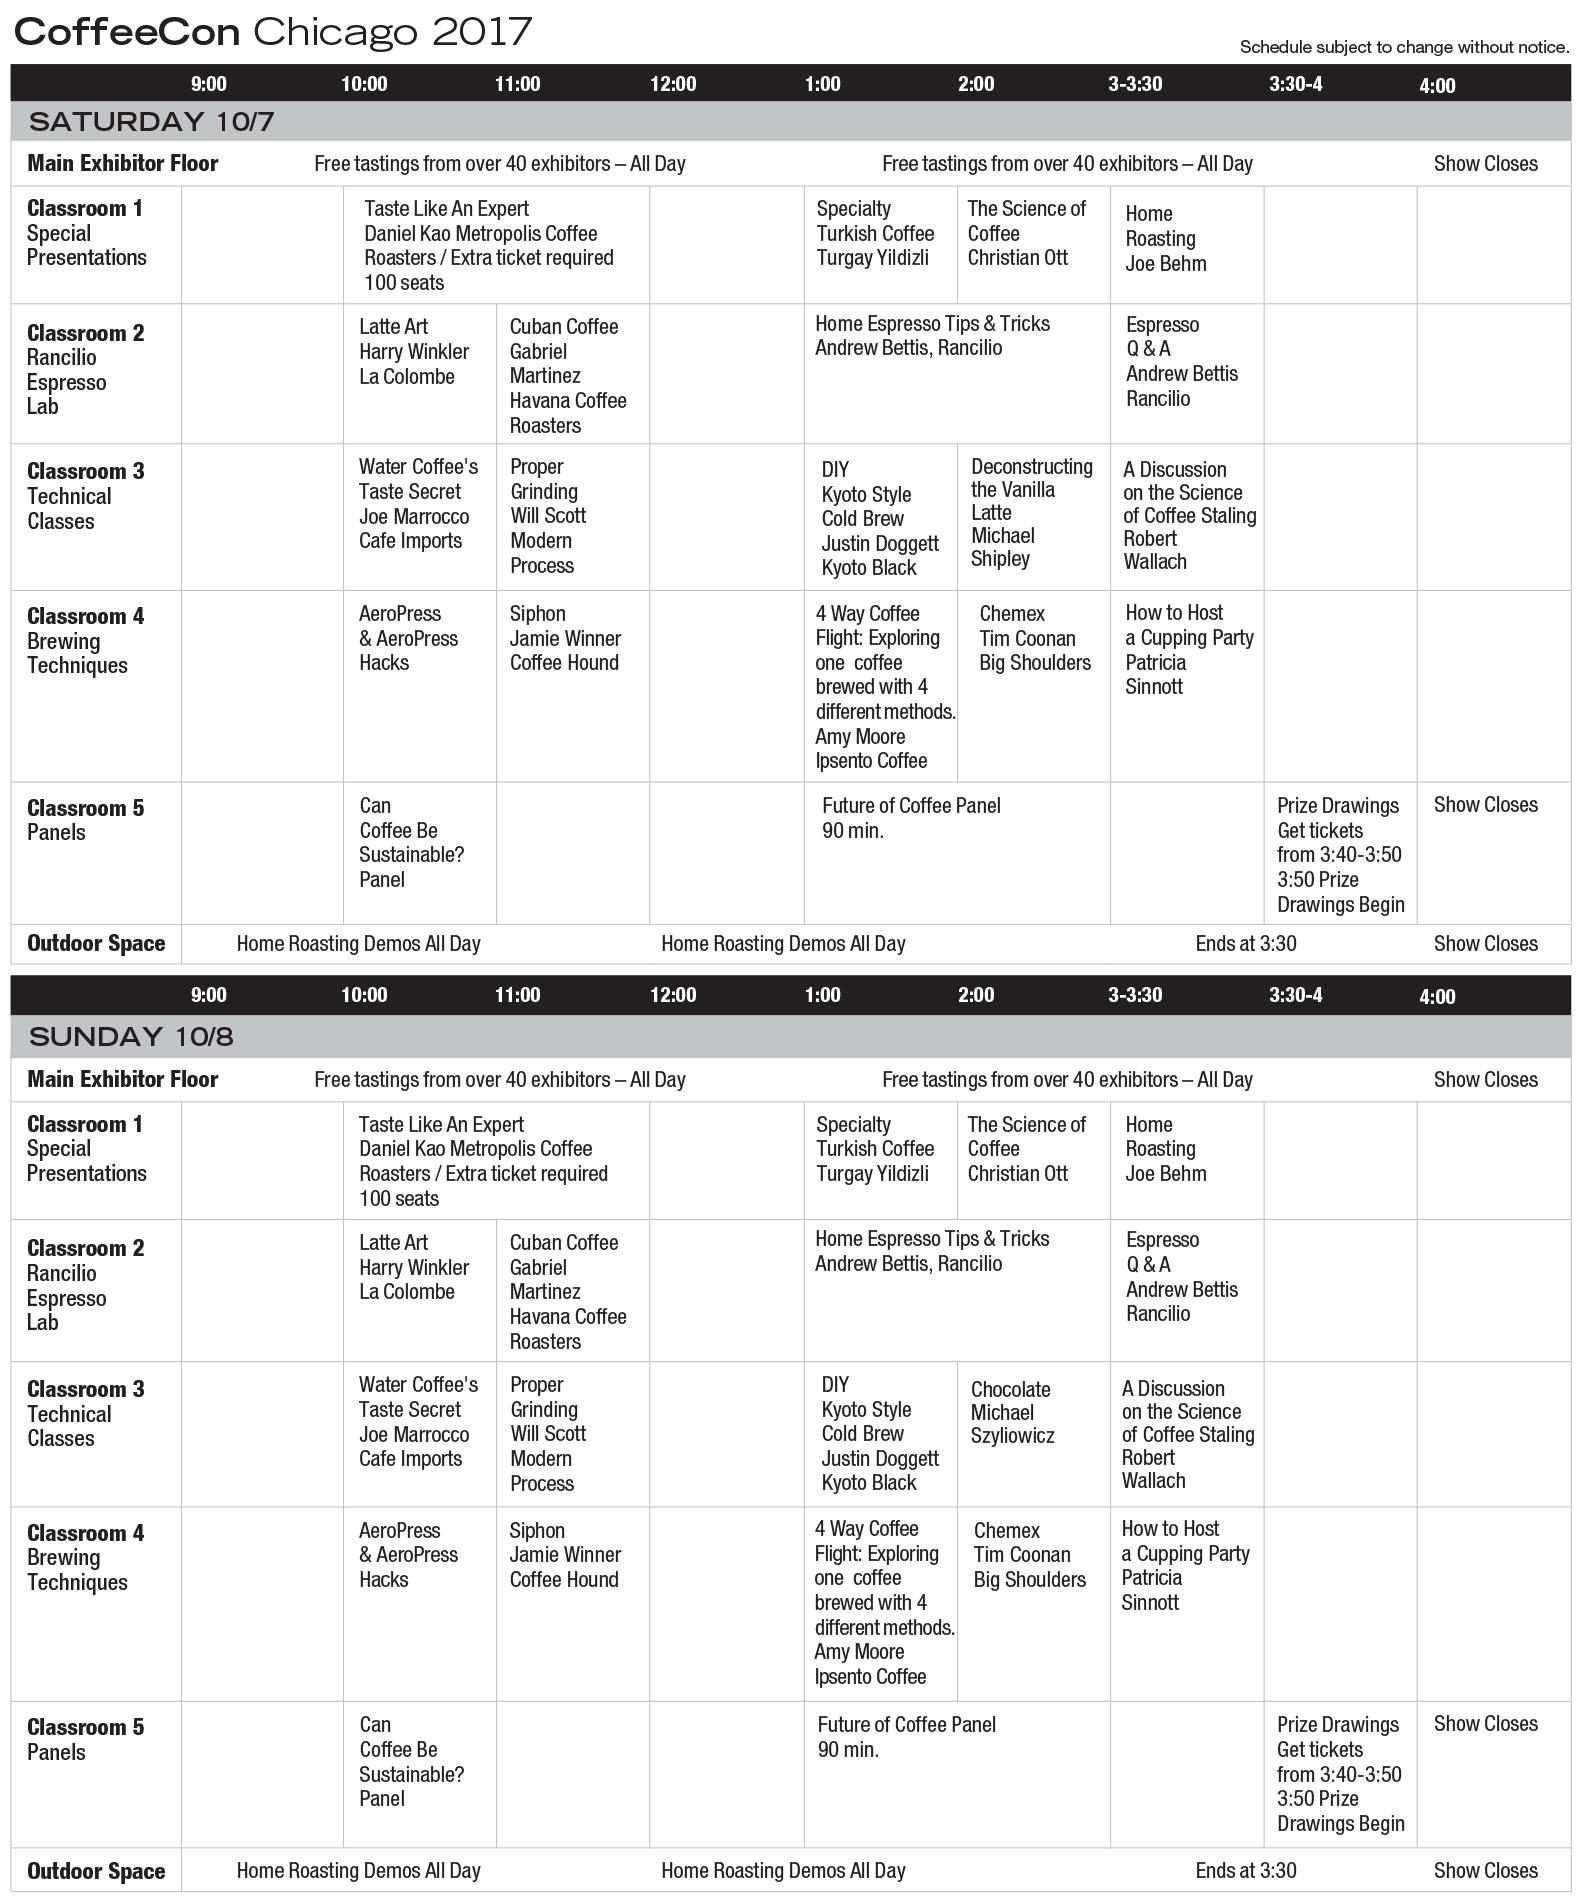 CoffeeConChicago 2017 Class Schedule